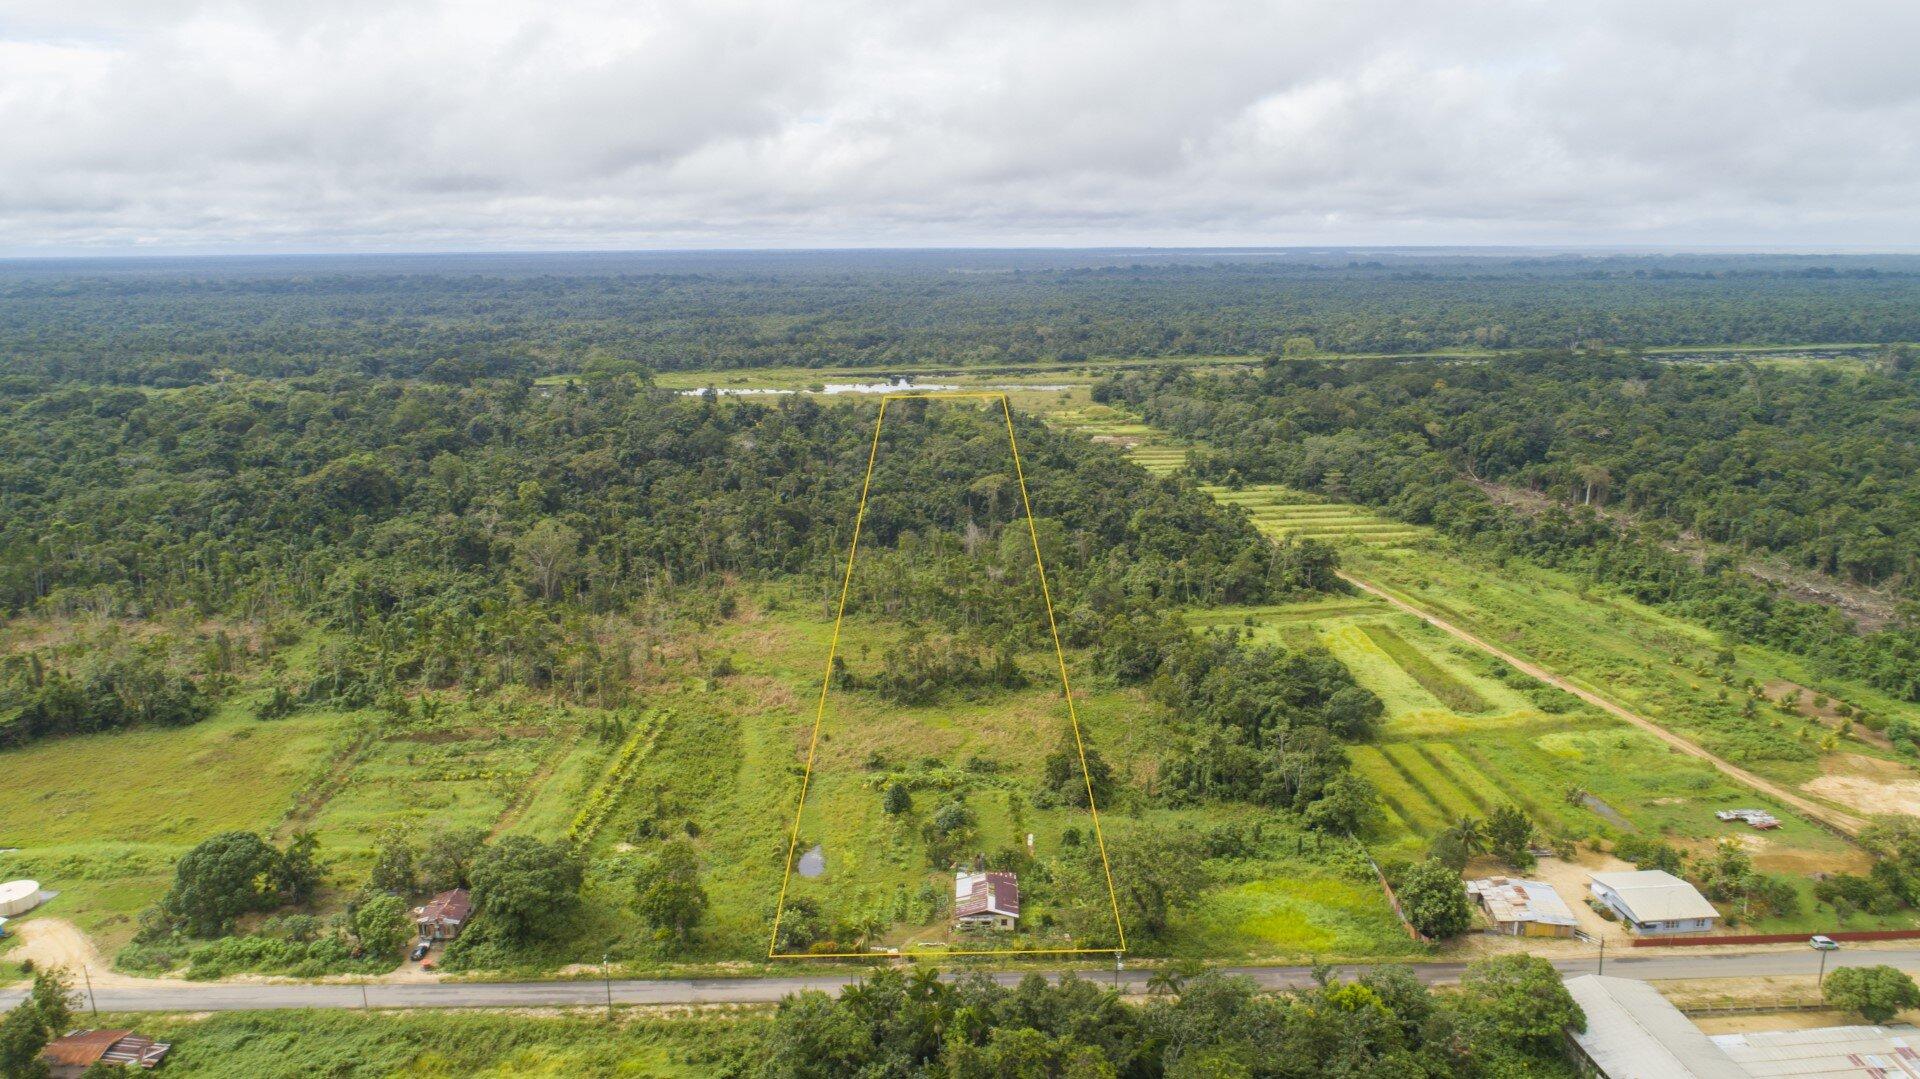 Coronieweg perc. 126 - 3.2 ha hoogwaardig tuinbouwgrond te Coronie - Surgoed Makelaardij NV - Paramaribo, Suriname